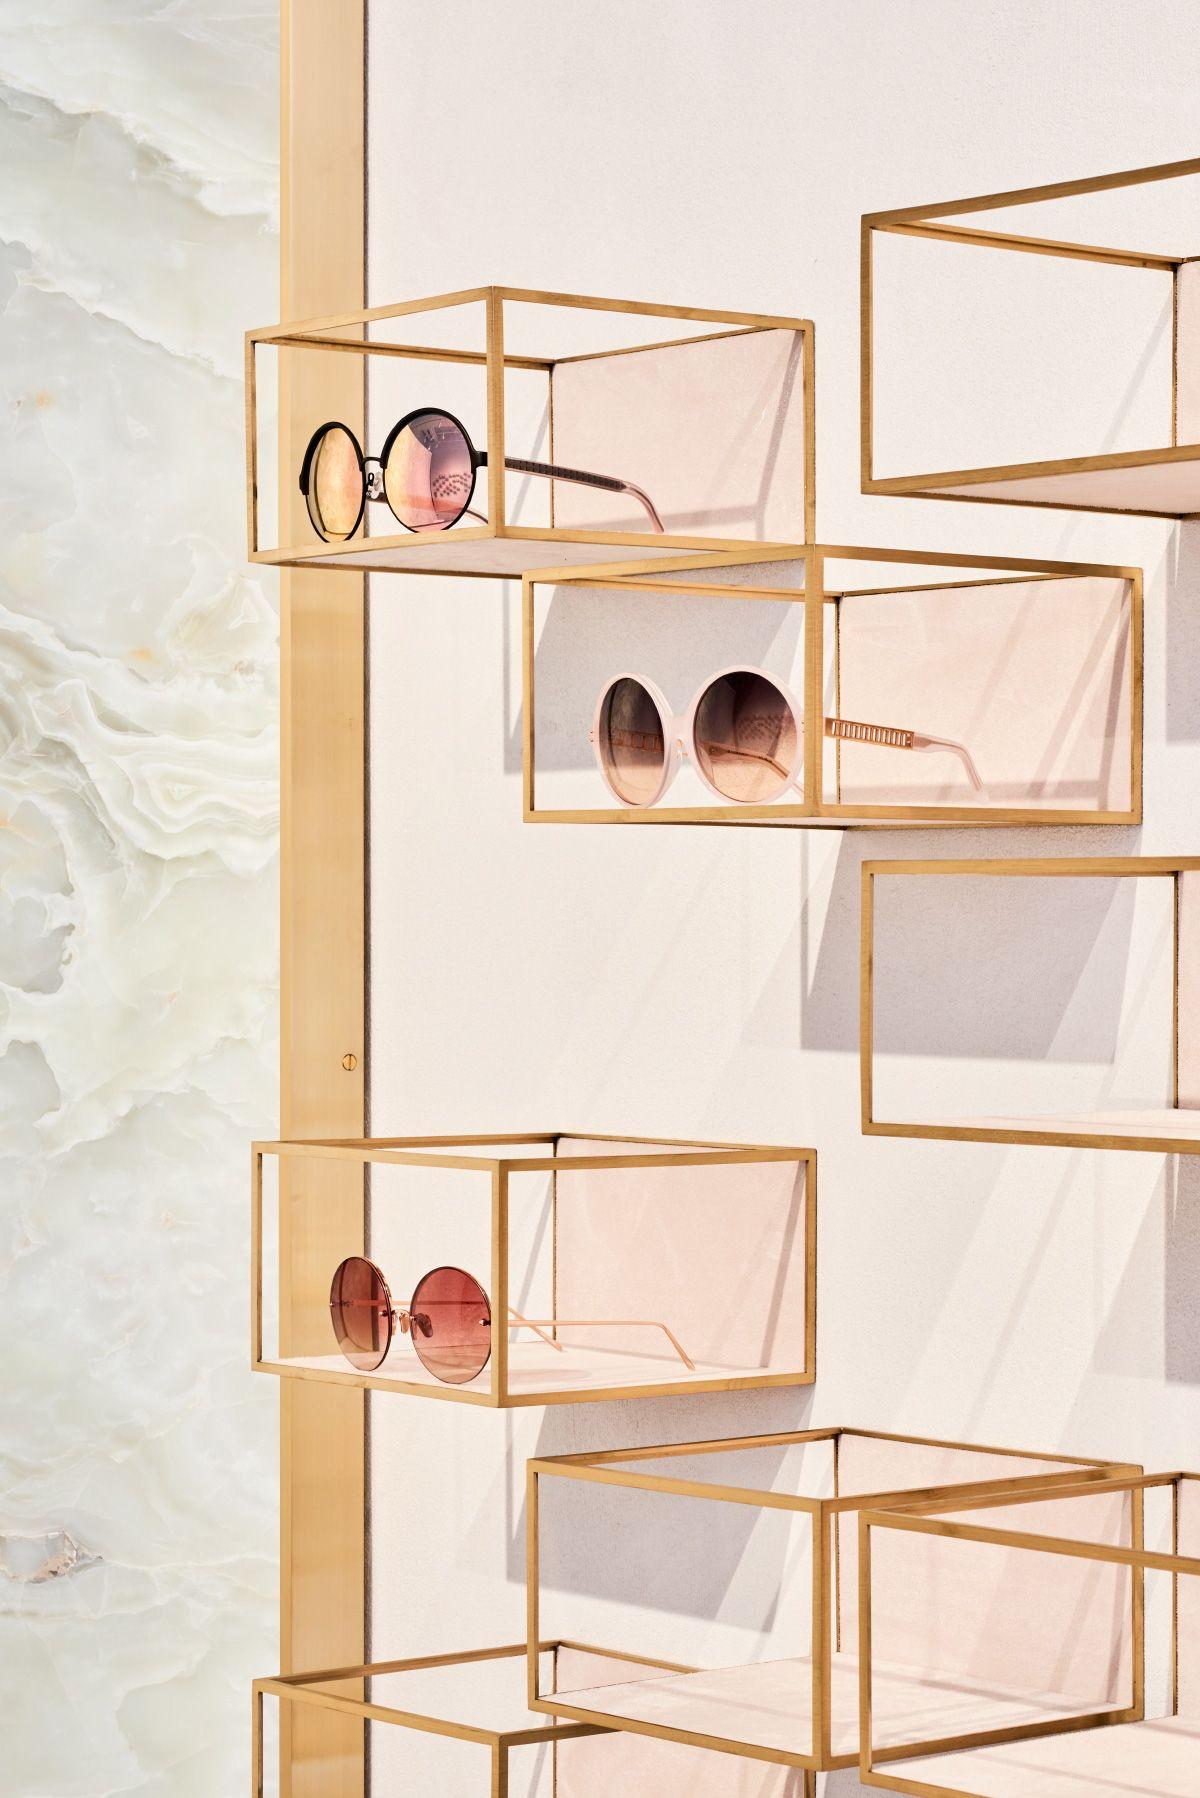 Studio Giancarlo Valle Designs Linda Farrows First Us Store In Soho